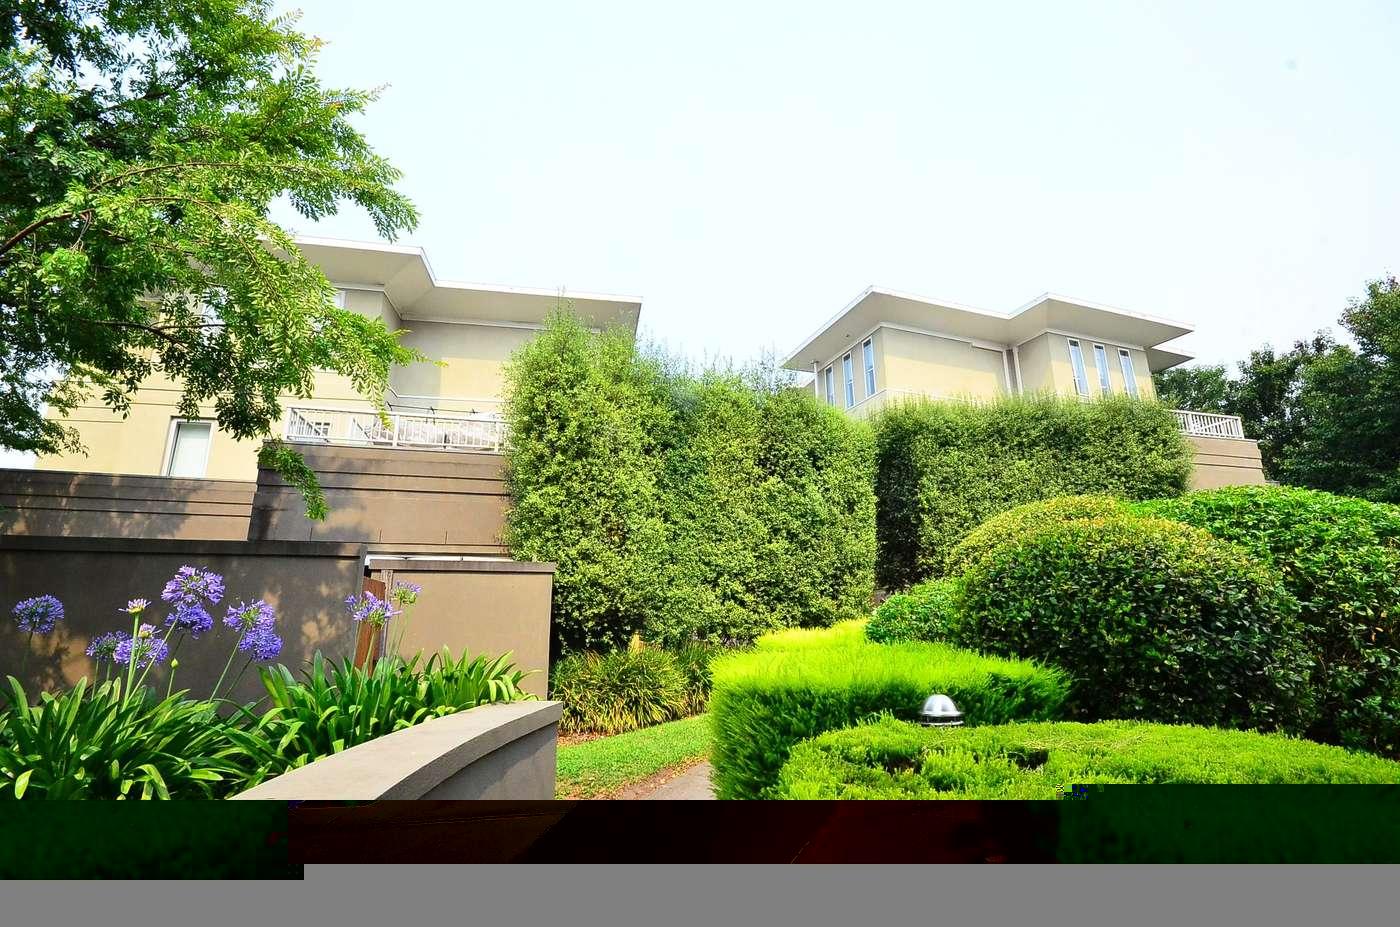 Main view of Homely apartment listing, 10/152-154 Princess Street, Kew, VIC 3101